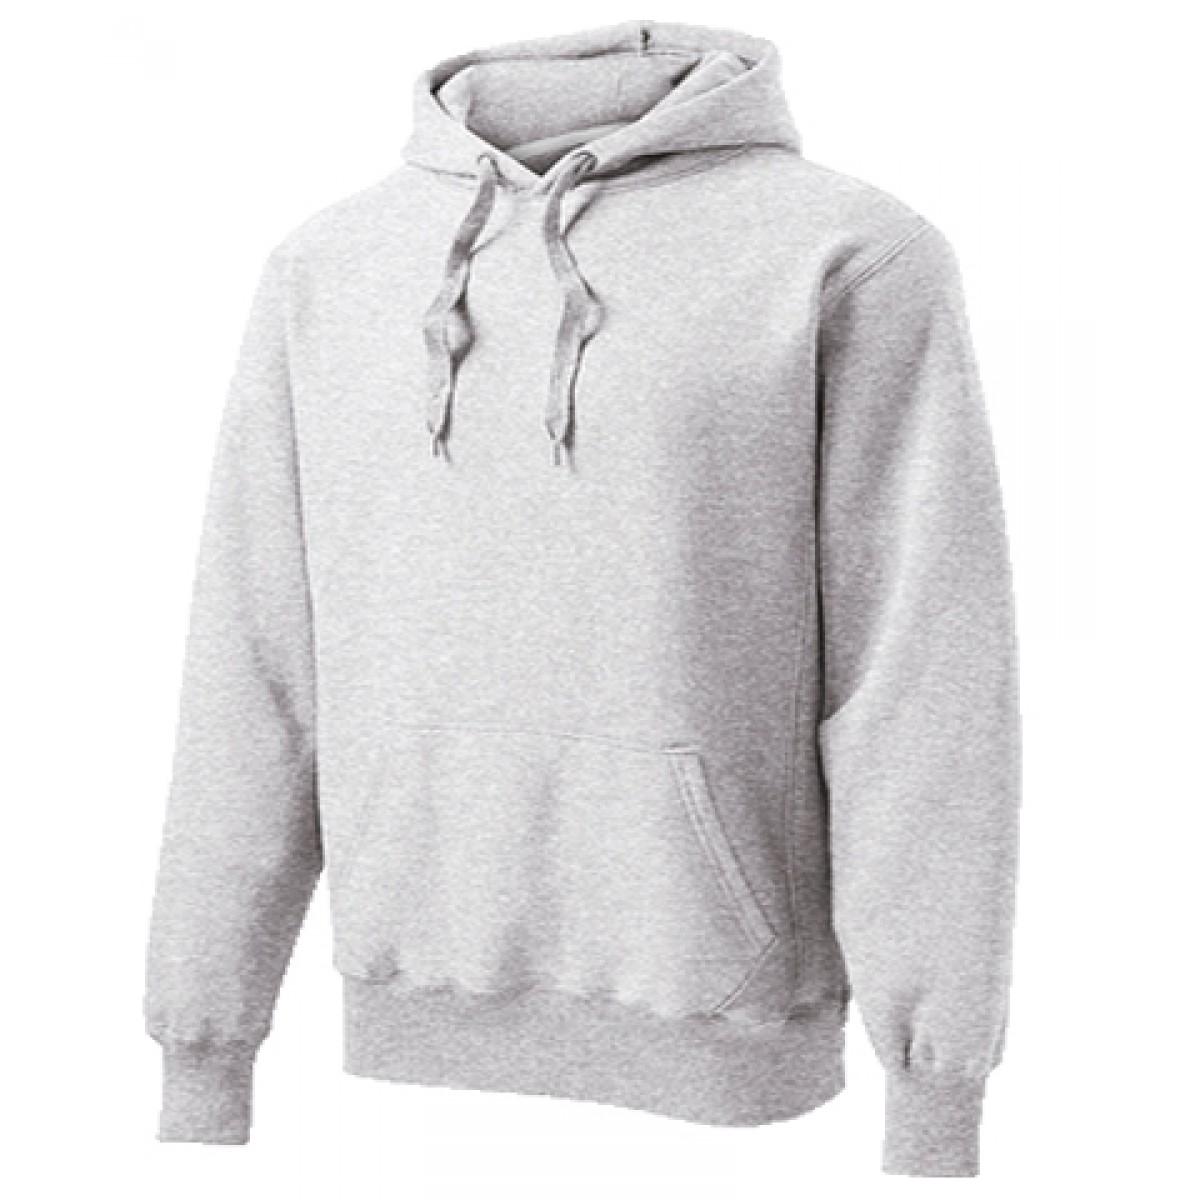 Hooded Sweatshirt 50/50 Heavy Blend Gray-Gray -L